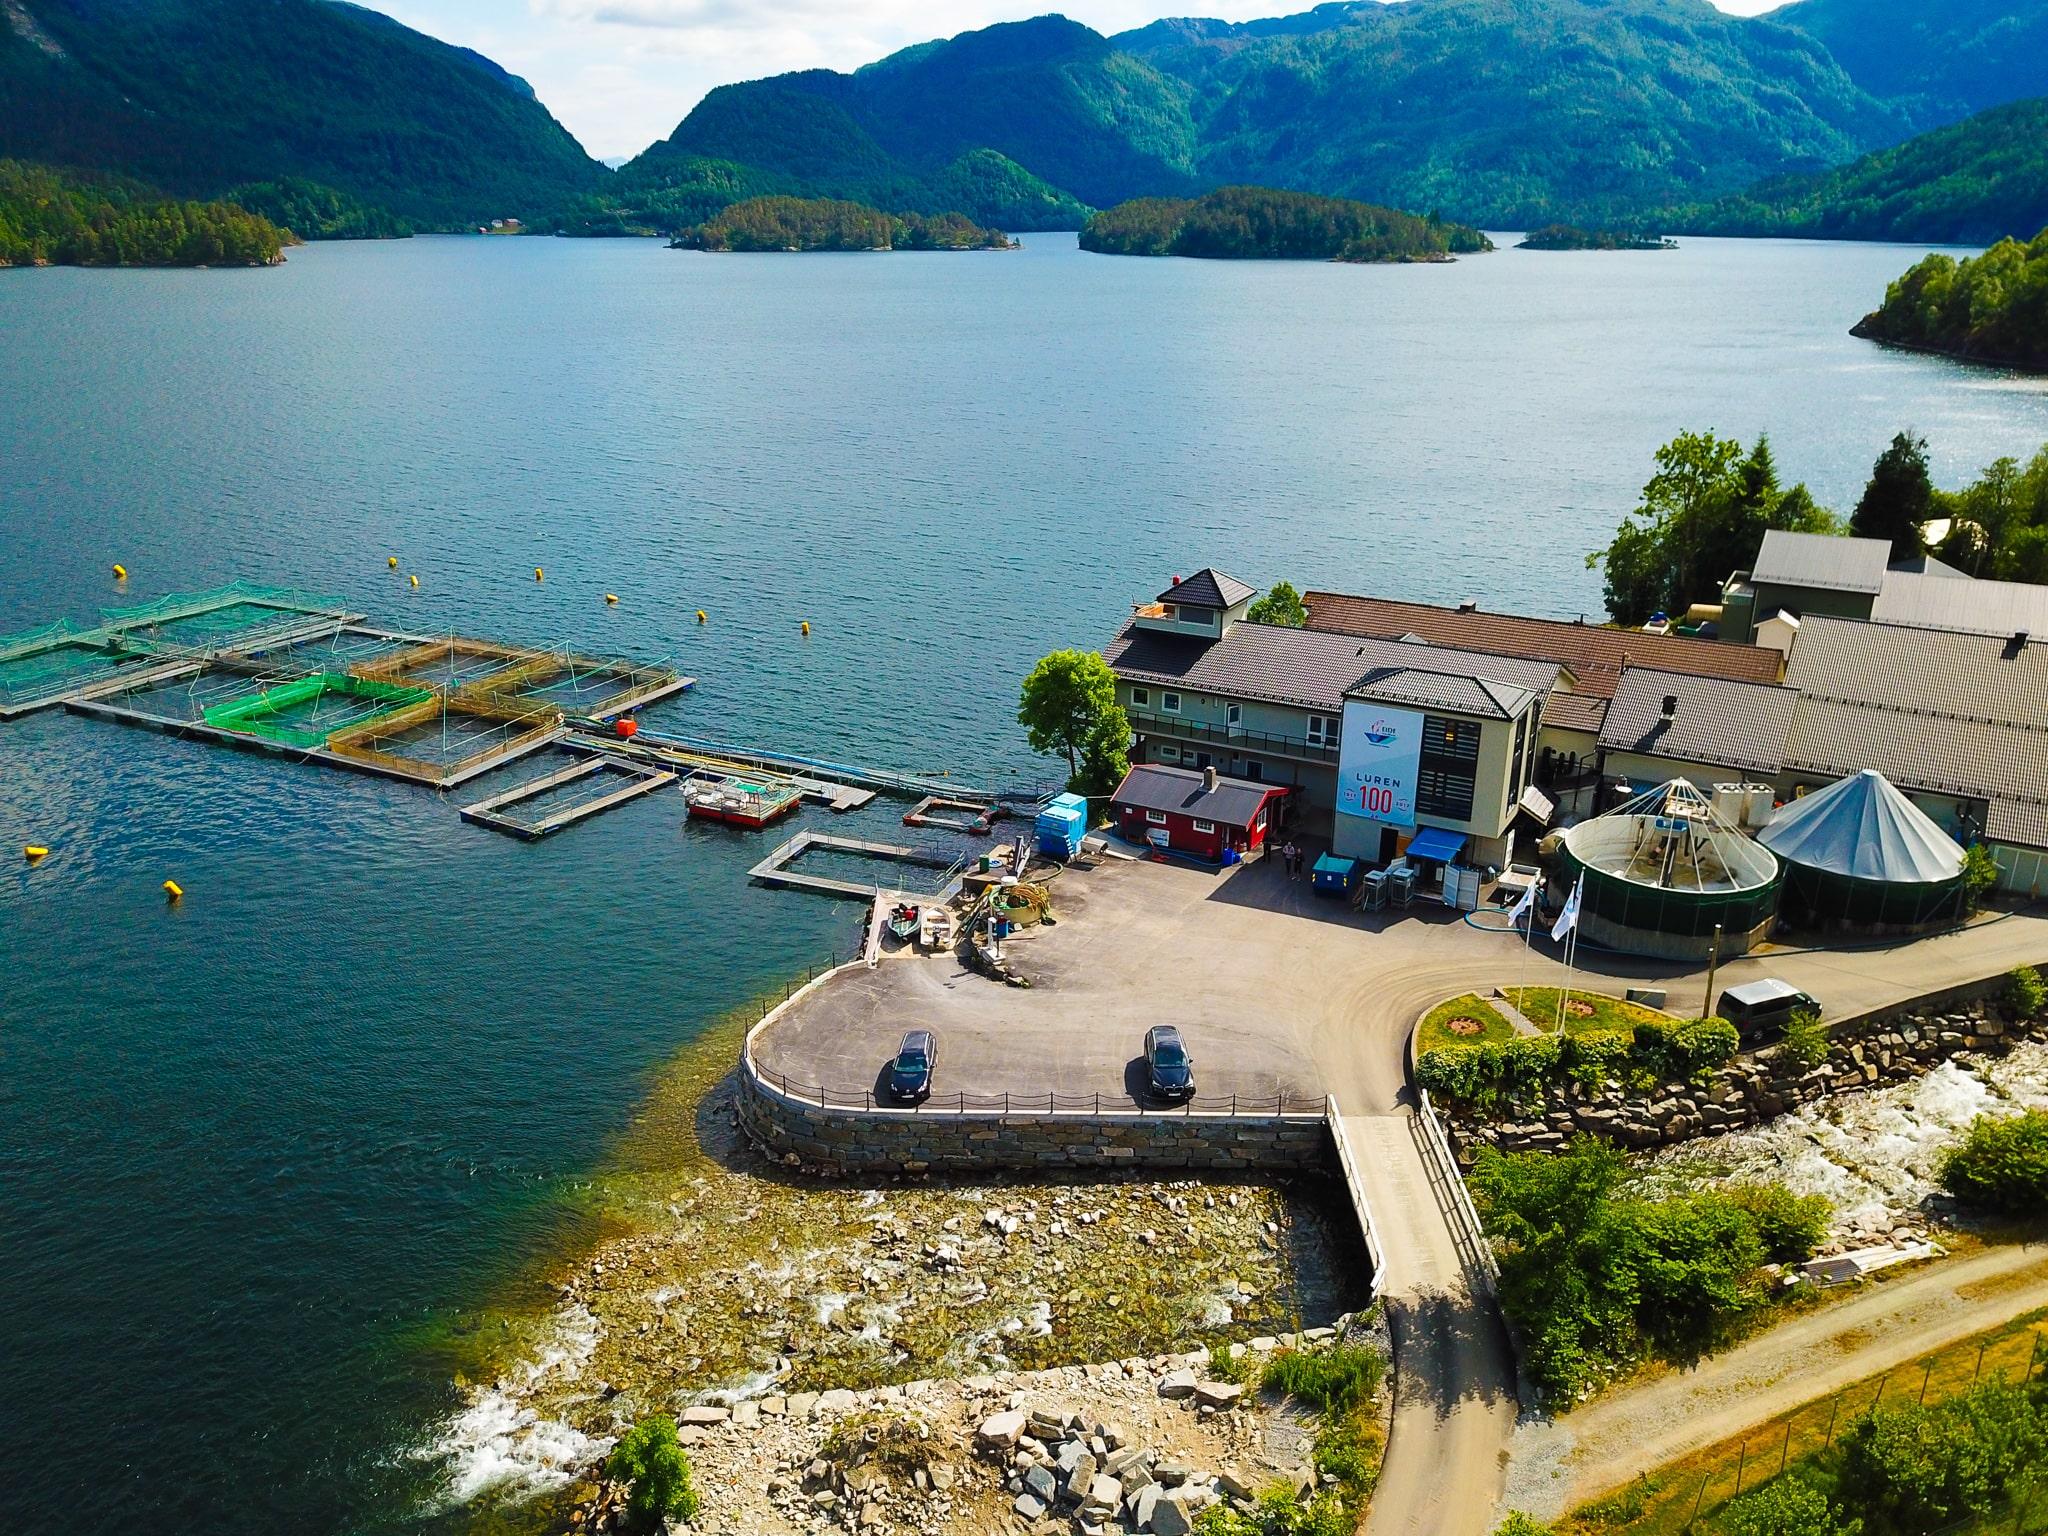 Eide Fjordbruk location overview.